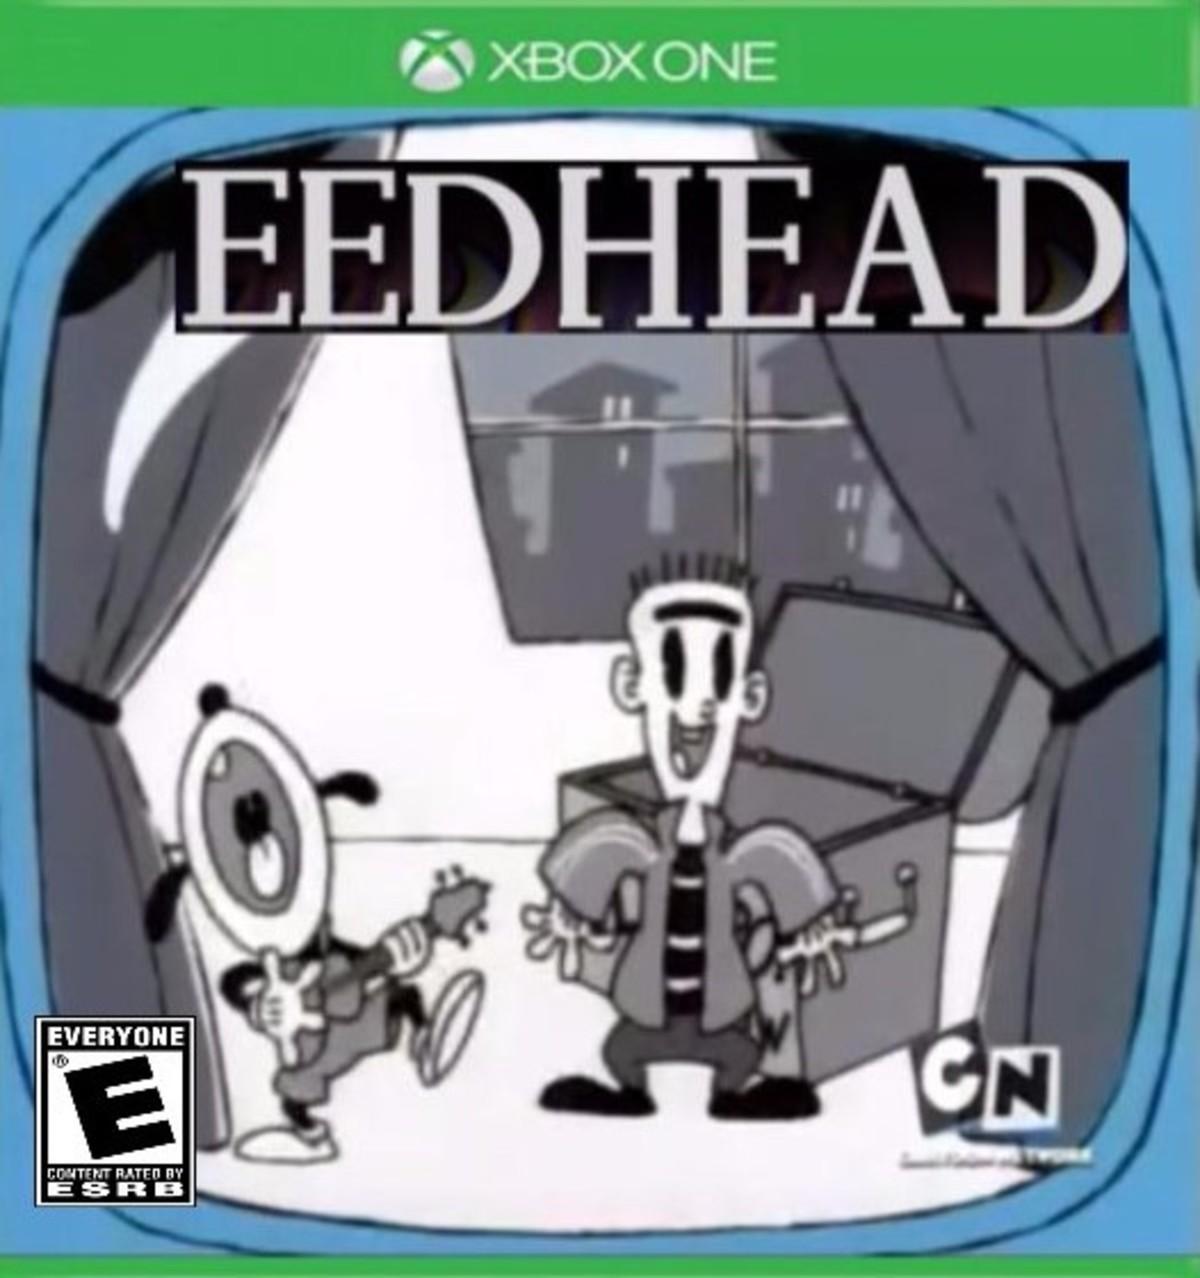 Eddhead. Rate E for Eddveryone... I misread it as Eddworld and got sad Eddhead Rate E for Eddveryone I misread it as Eddworld and got sad